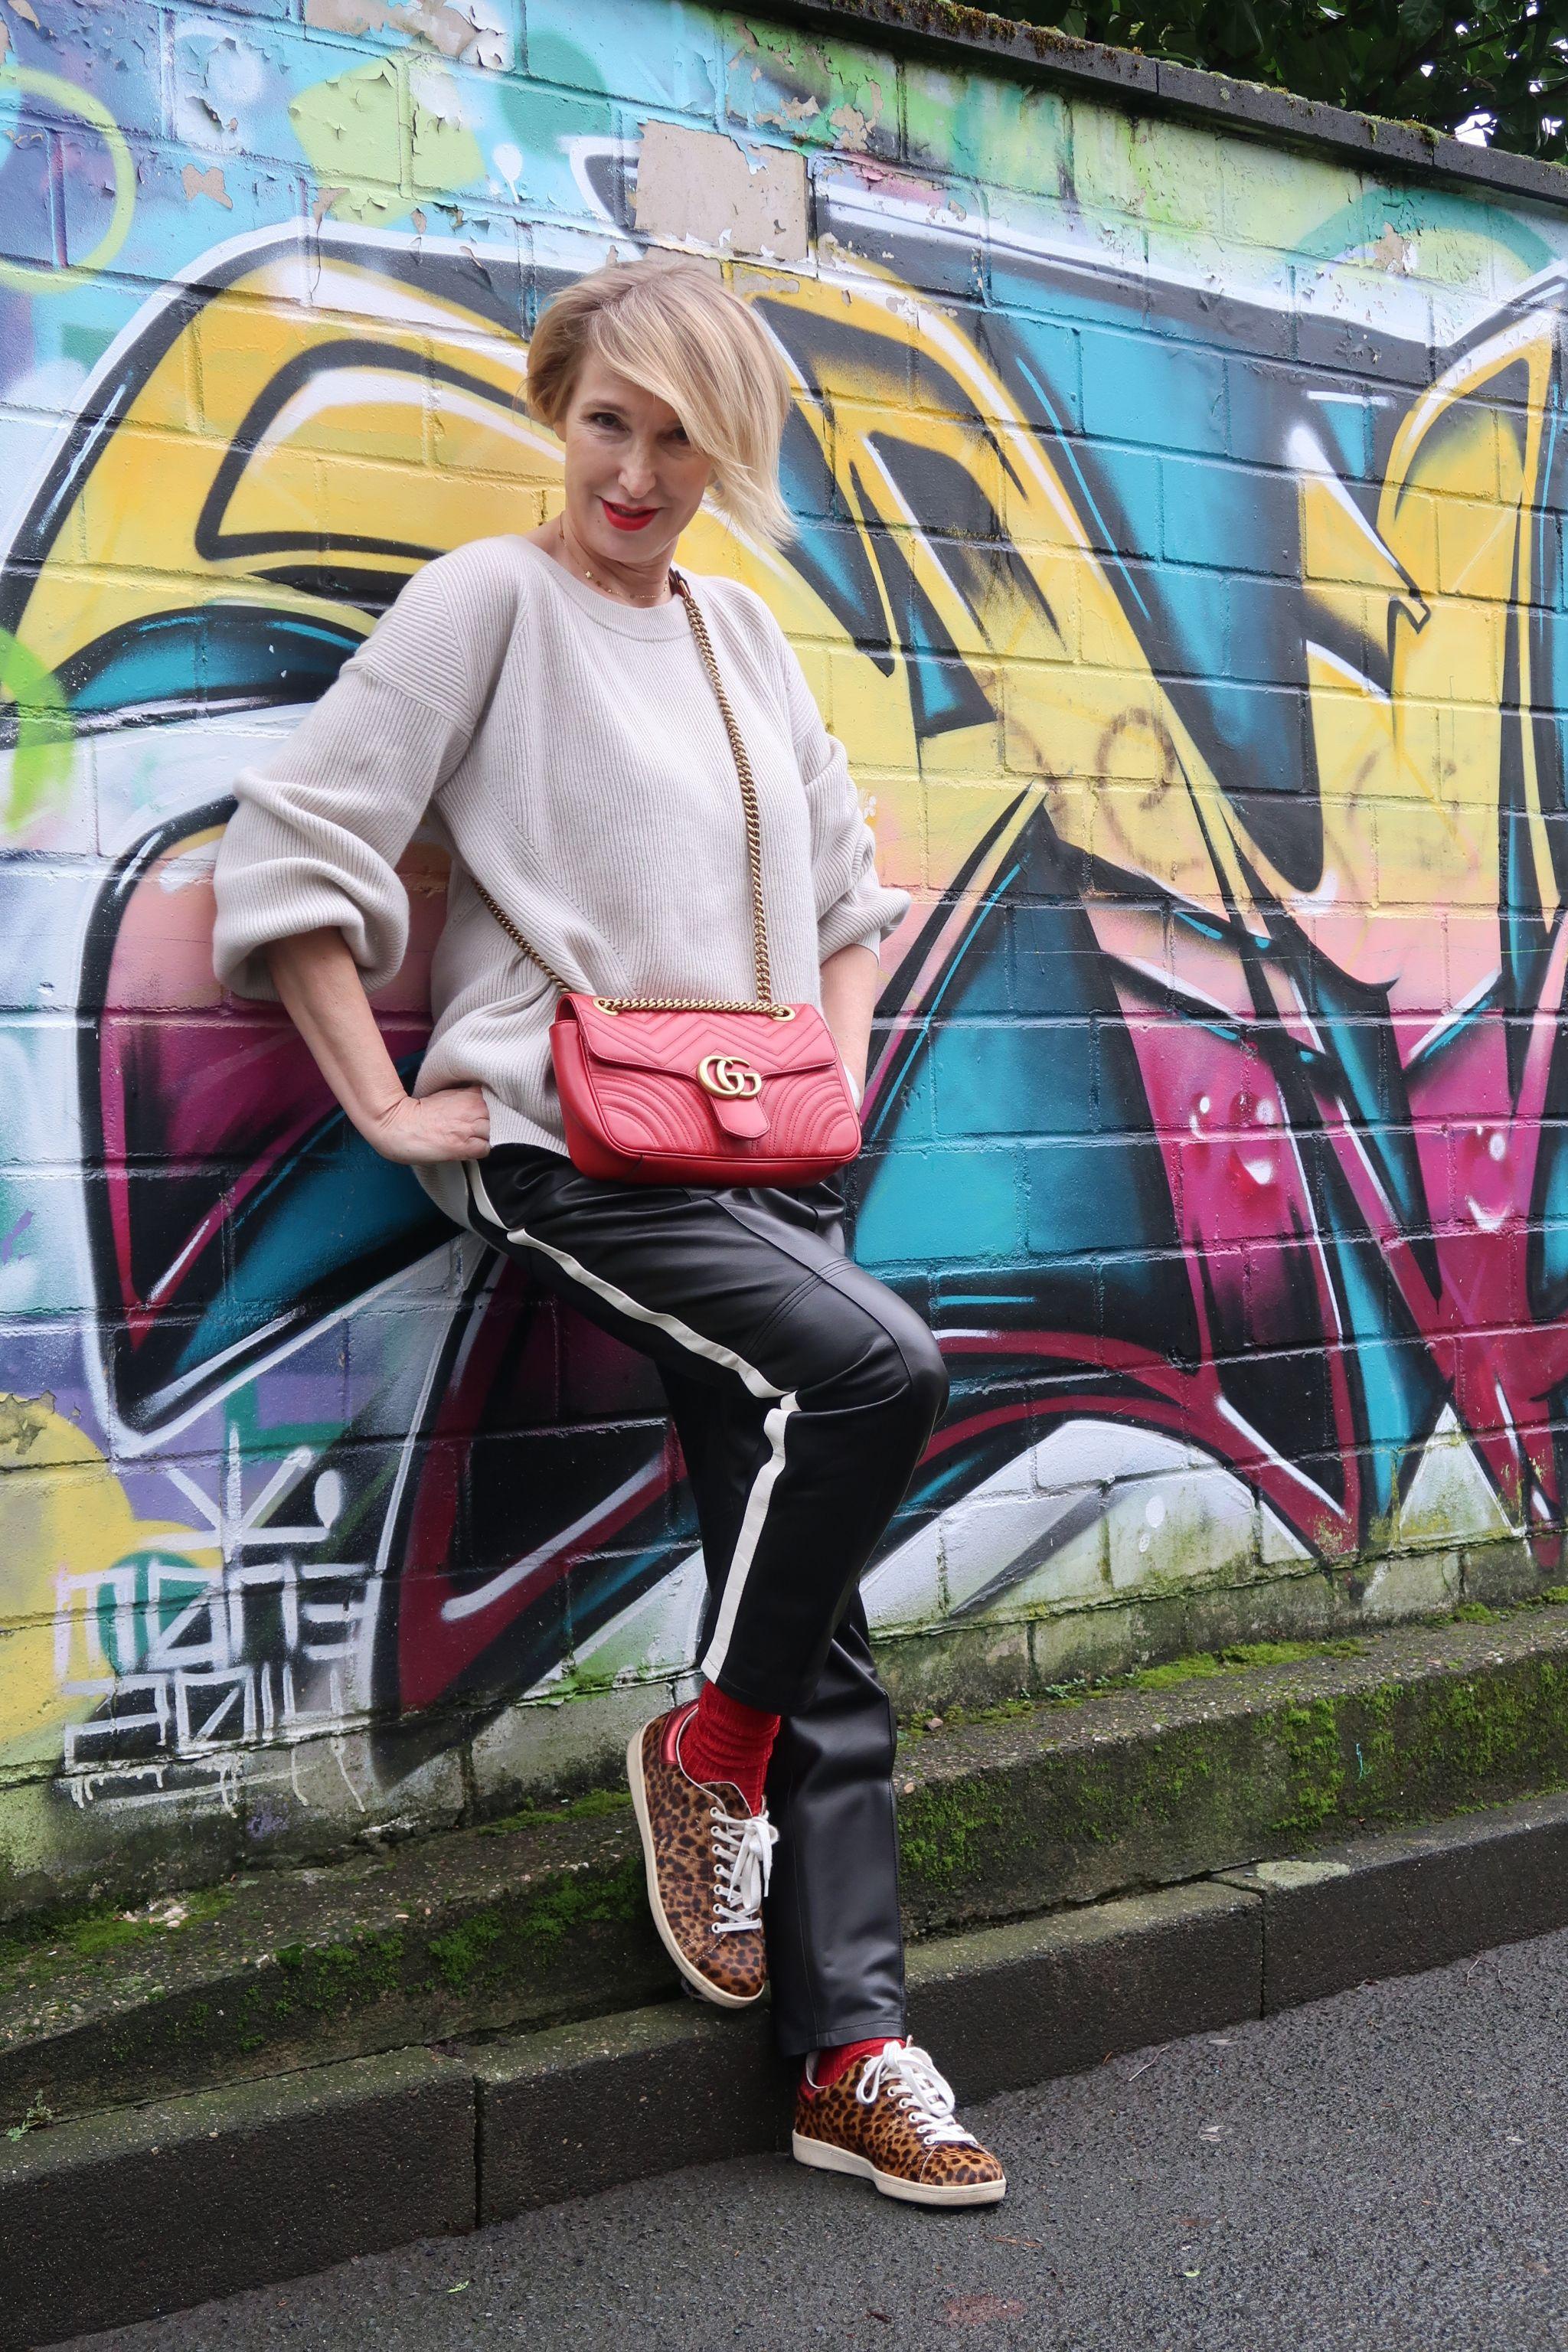 glamupyourlifestyle lederhose leo-sneakers track-pants kaschmir-Pullover Dorothee-Schumacher ue40-Mode ue40-Blog